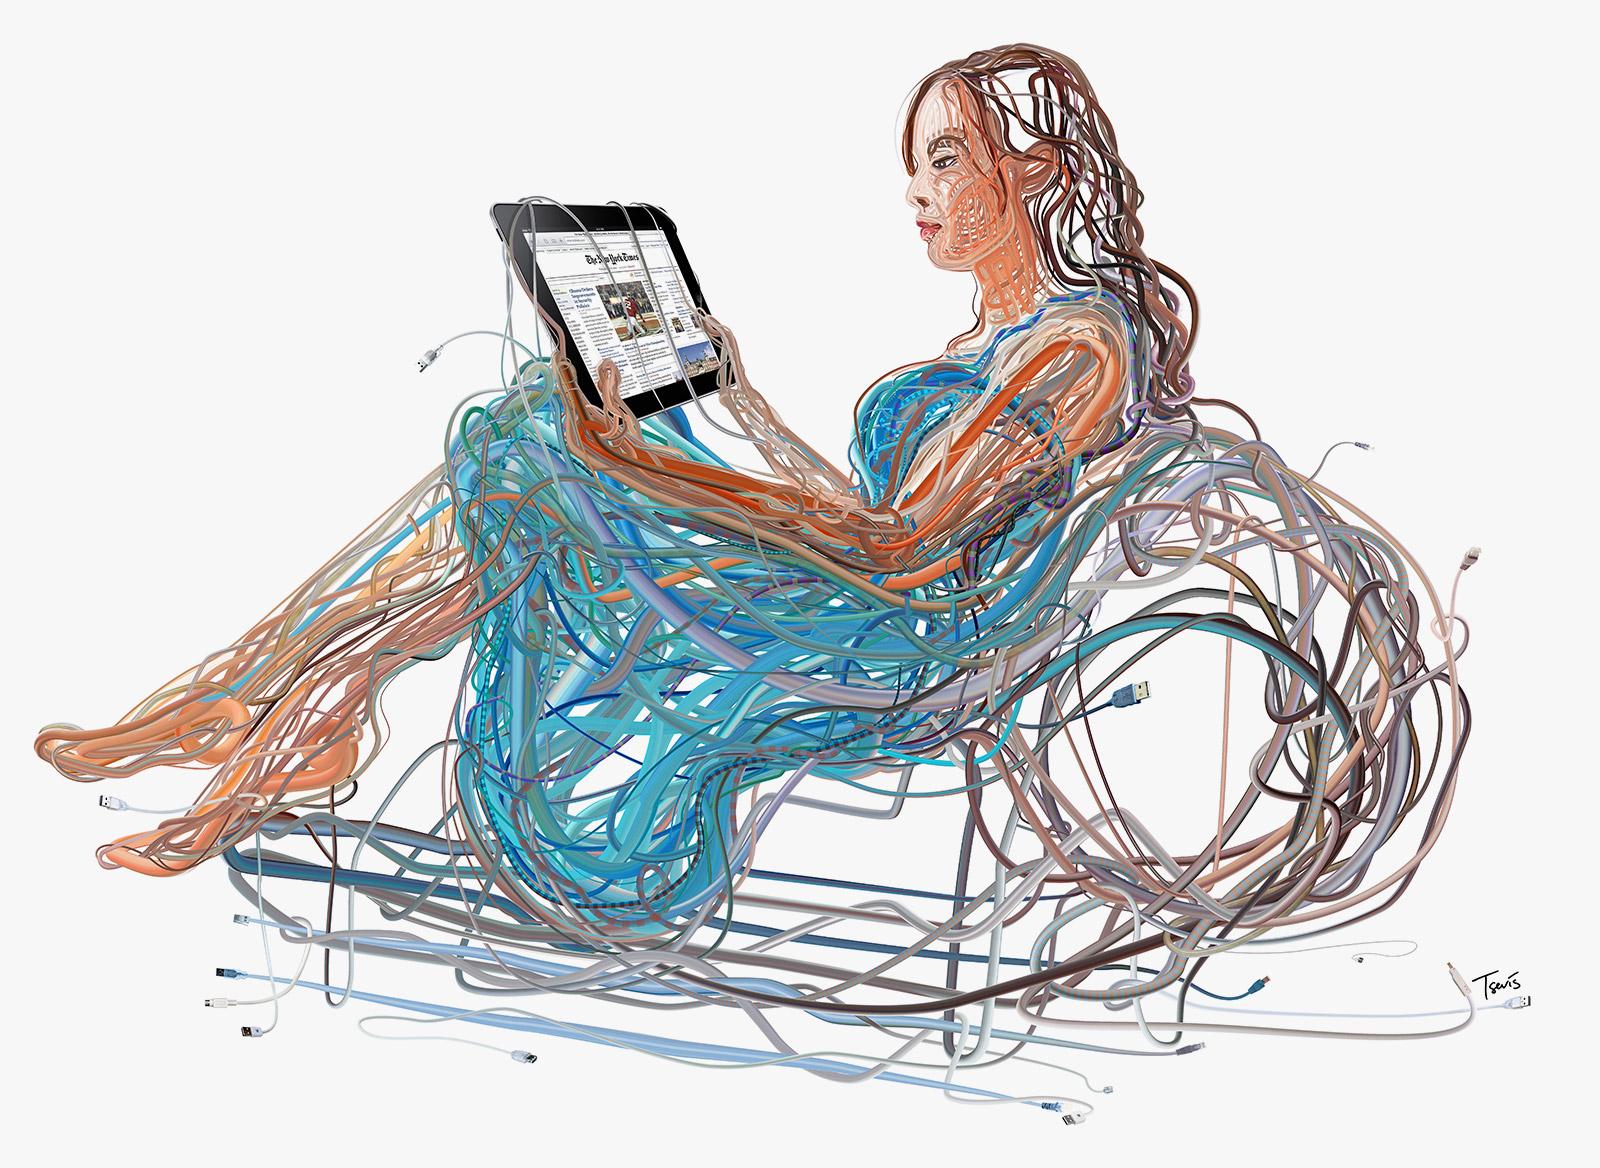 wire-illustration-charis-tsevis-06